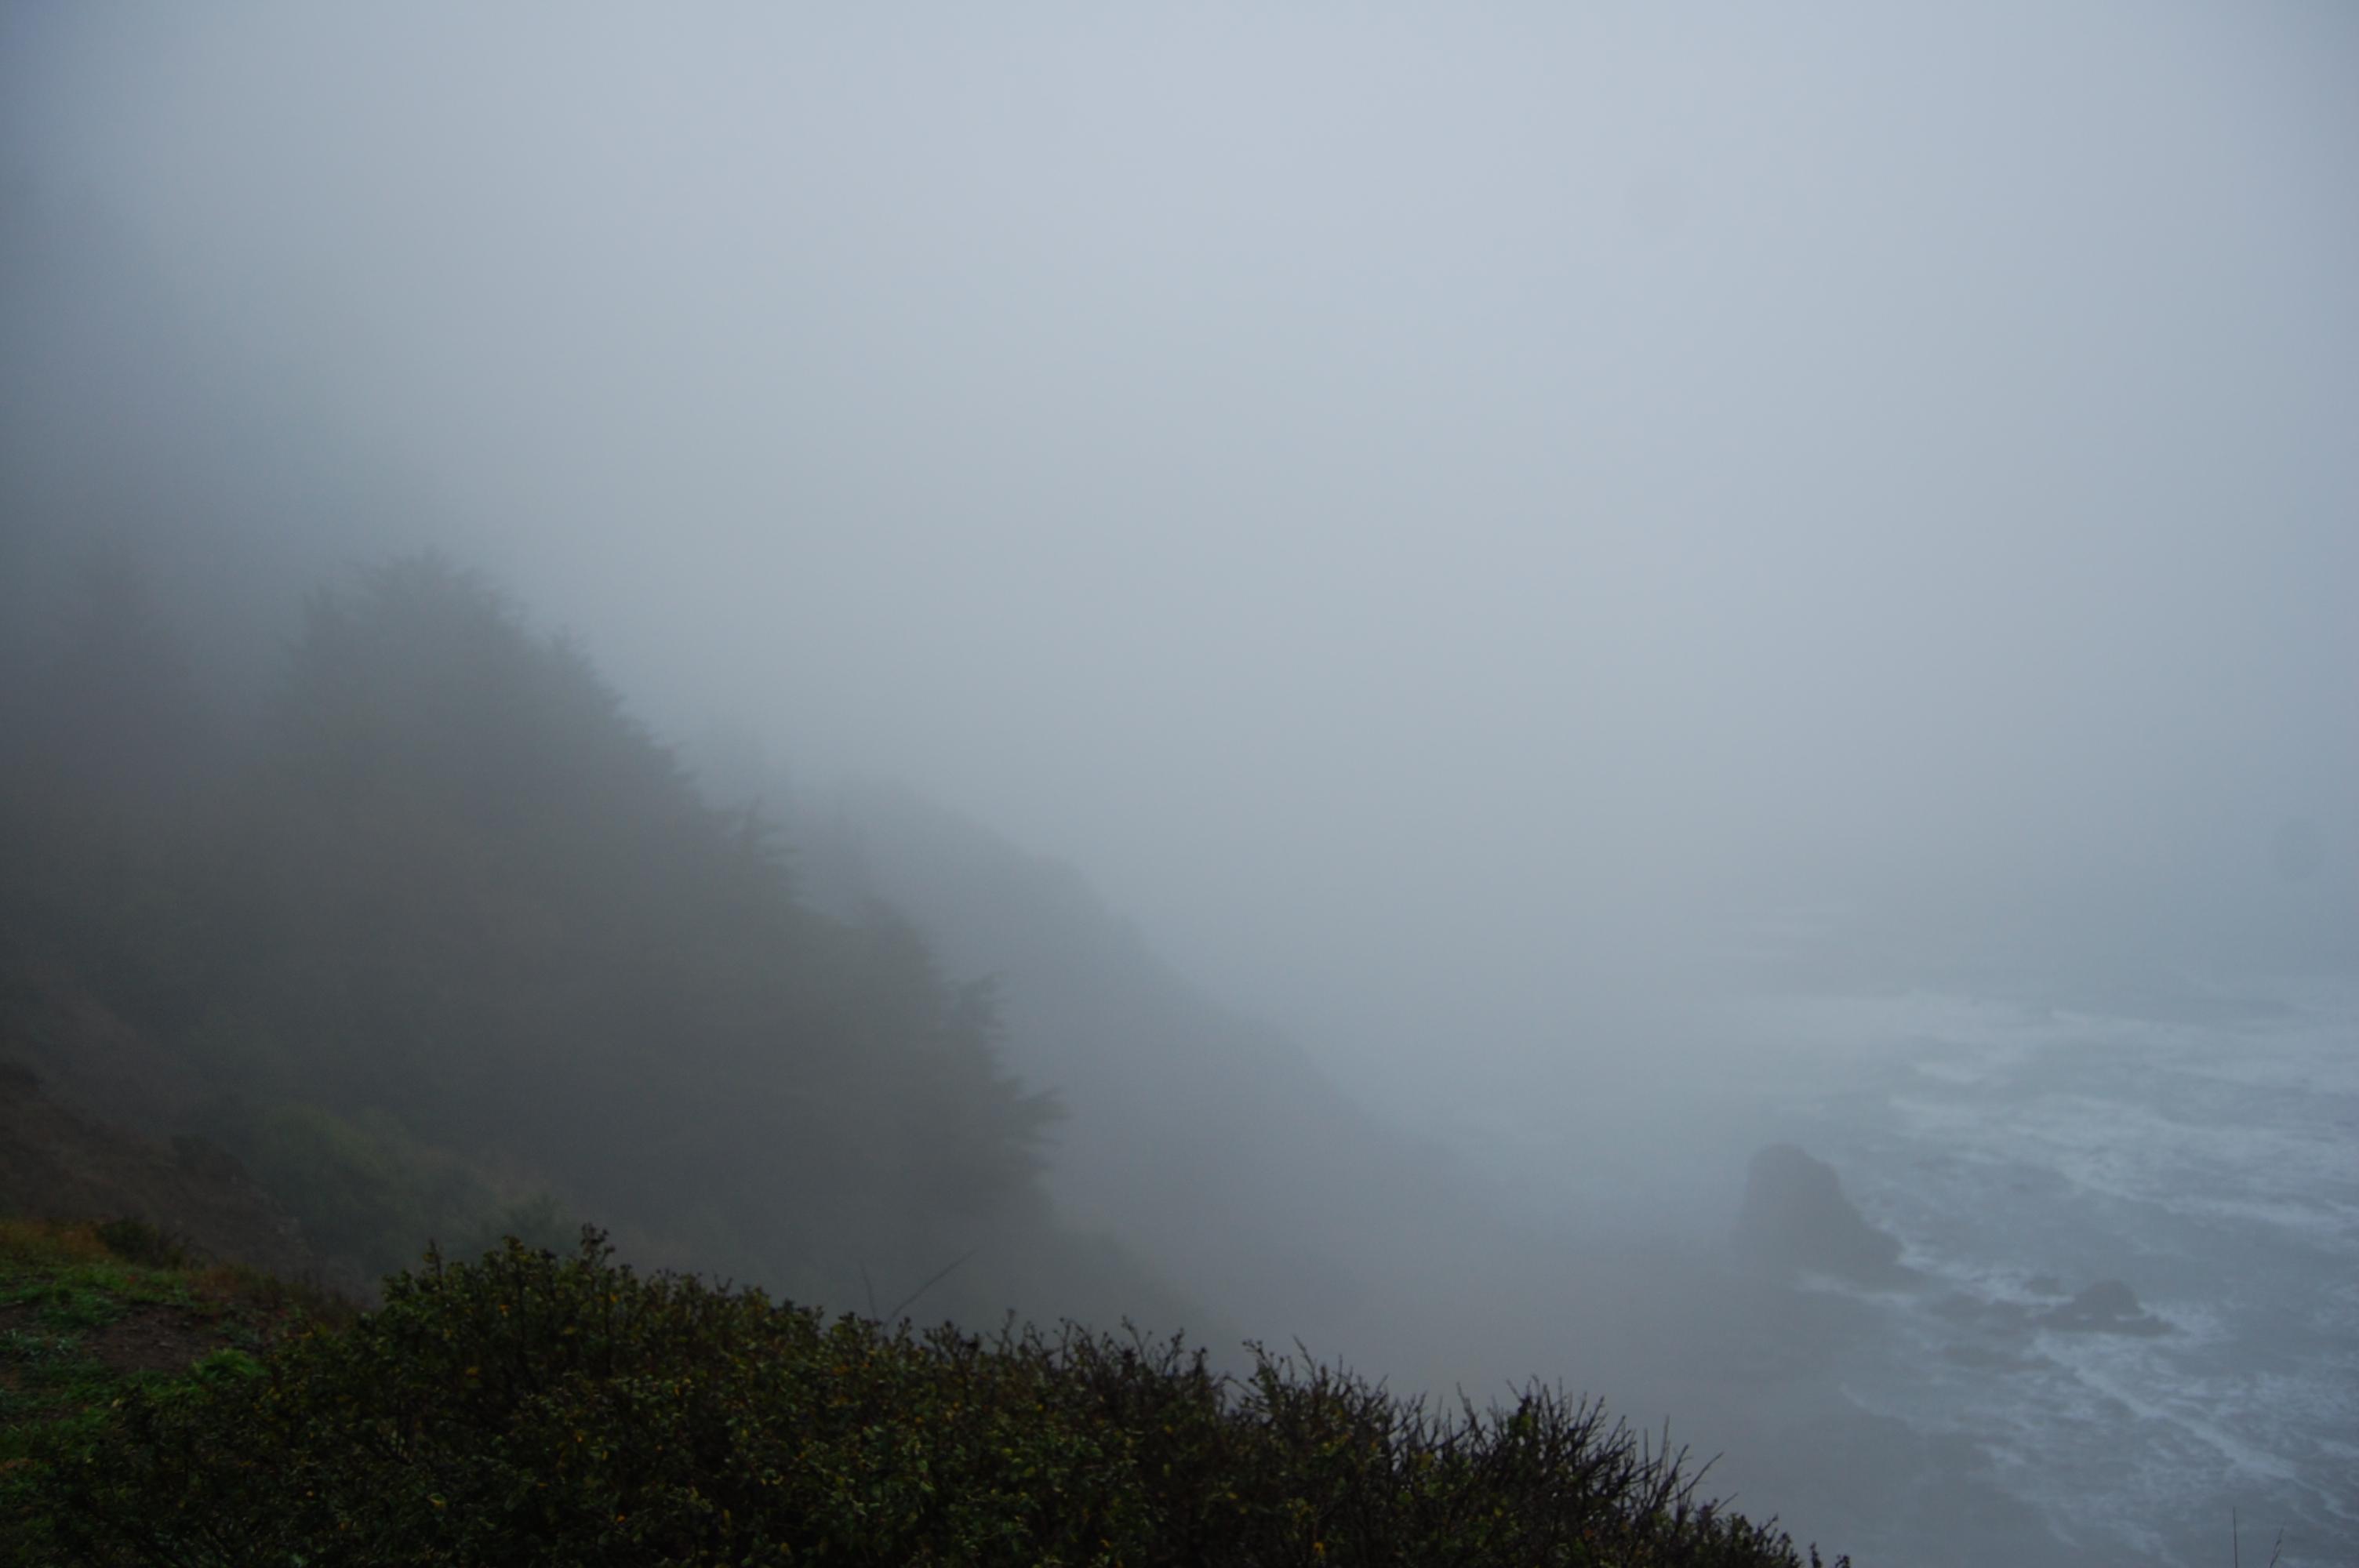 Fog at Endert's Beach Overlook